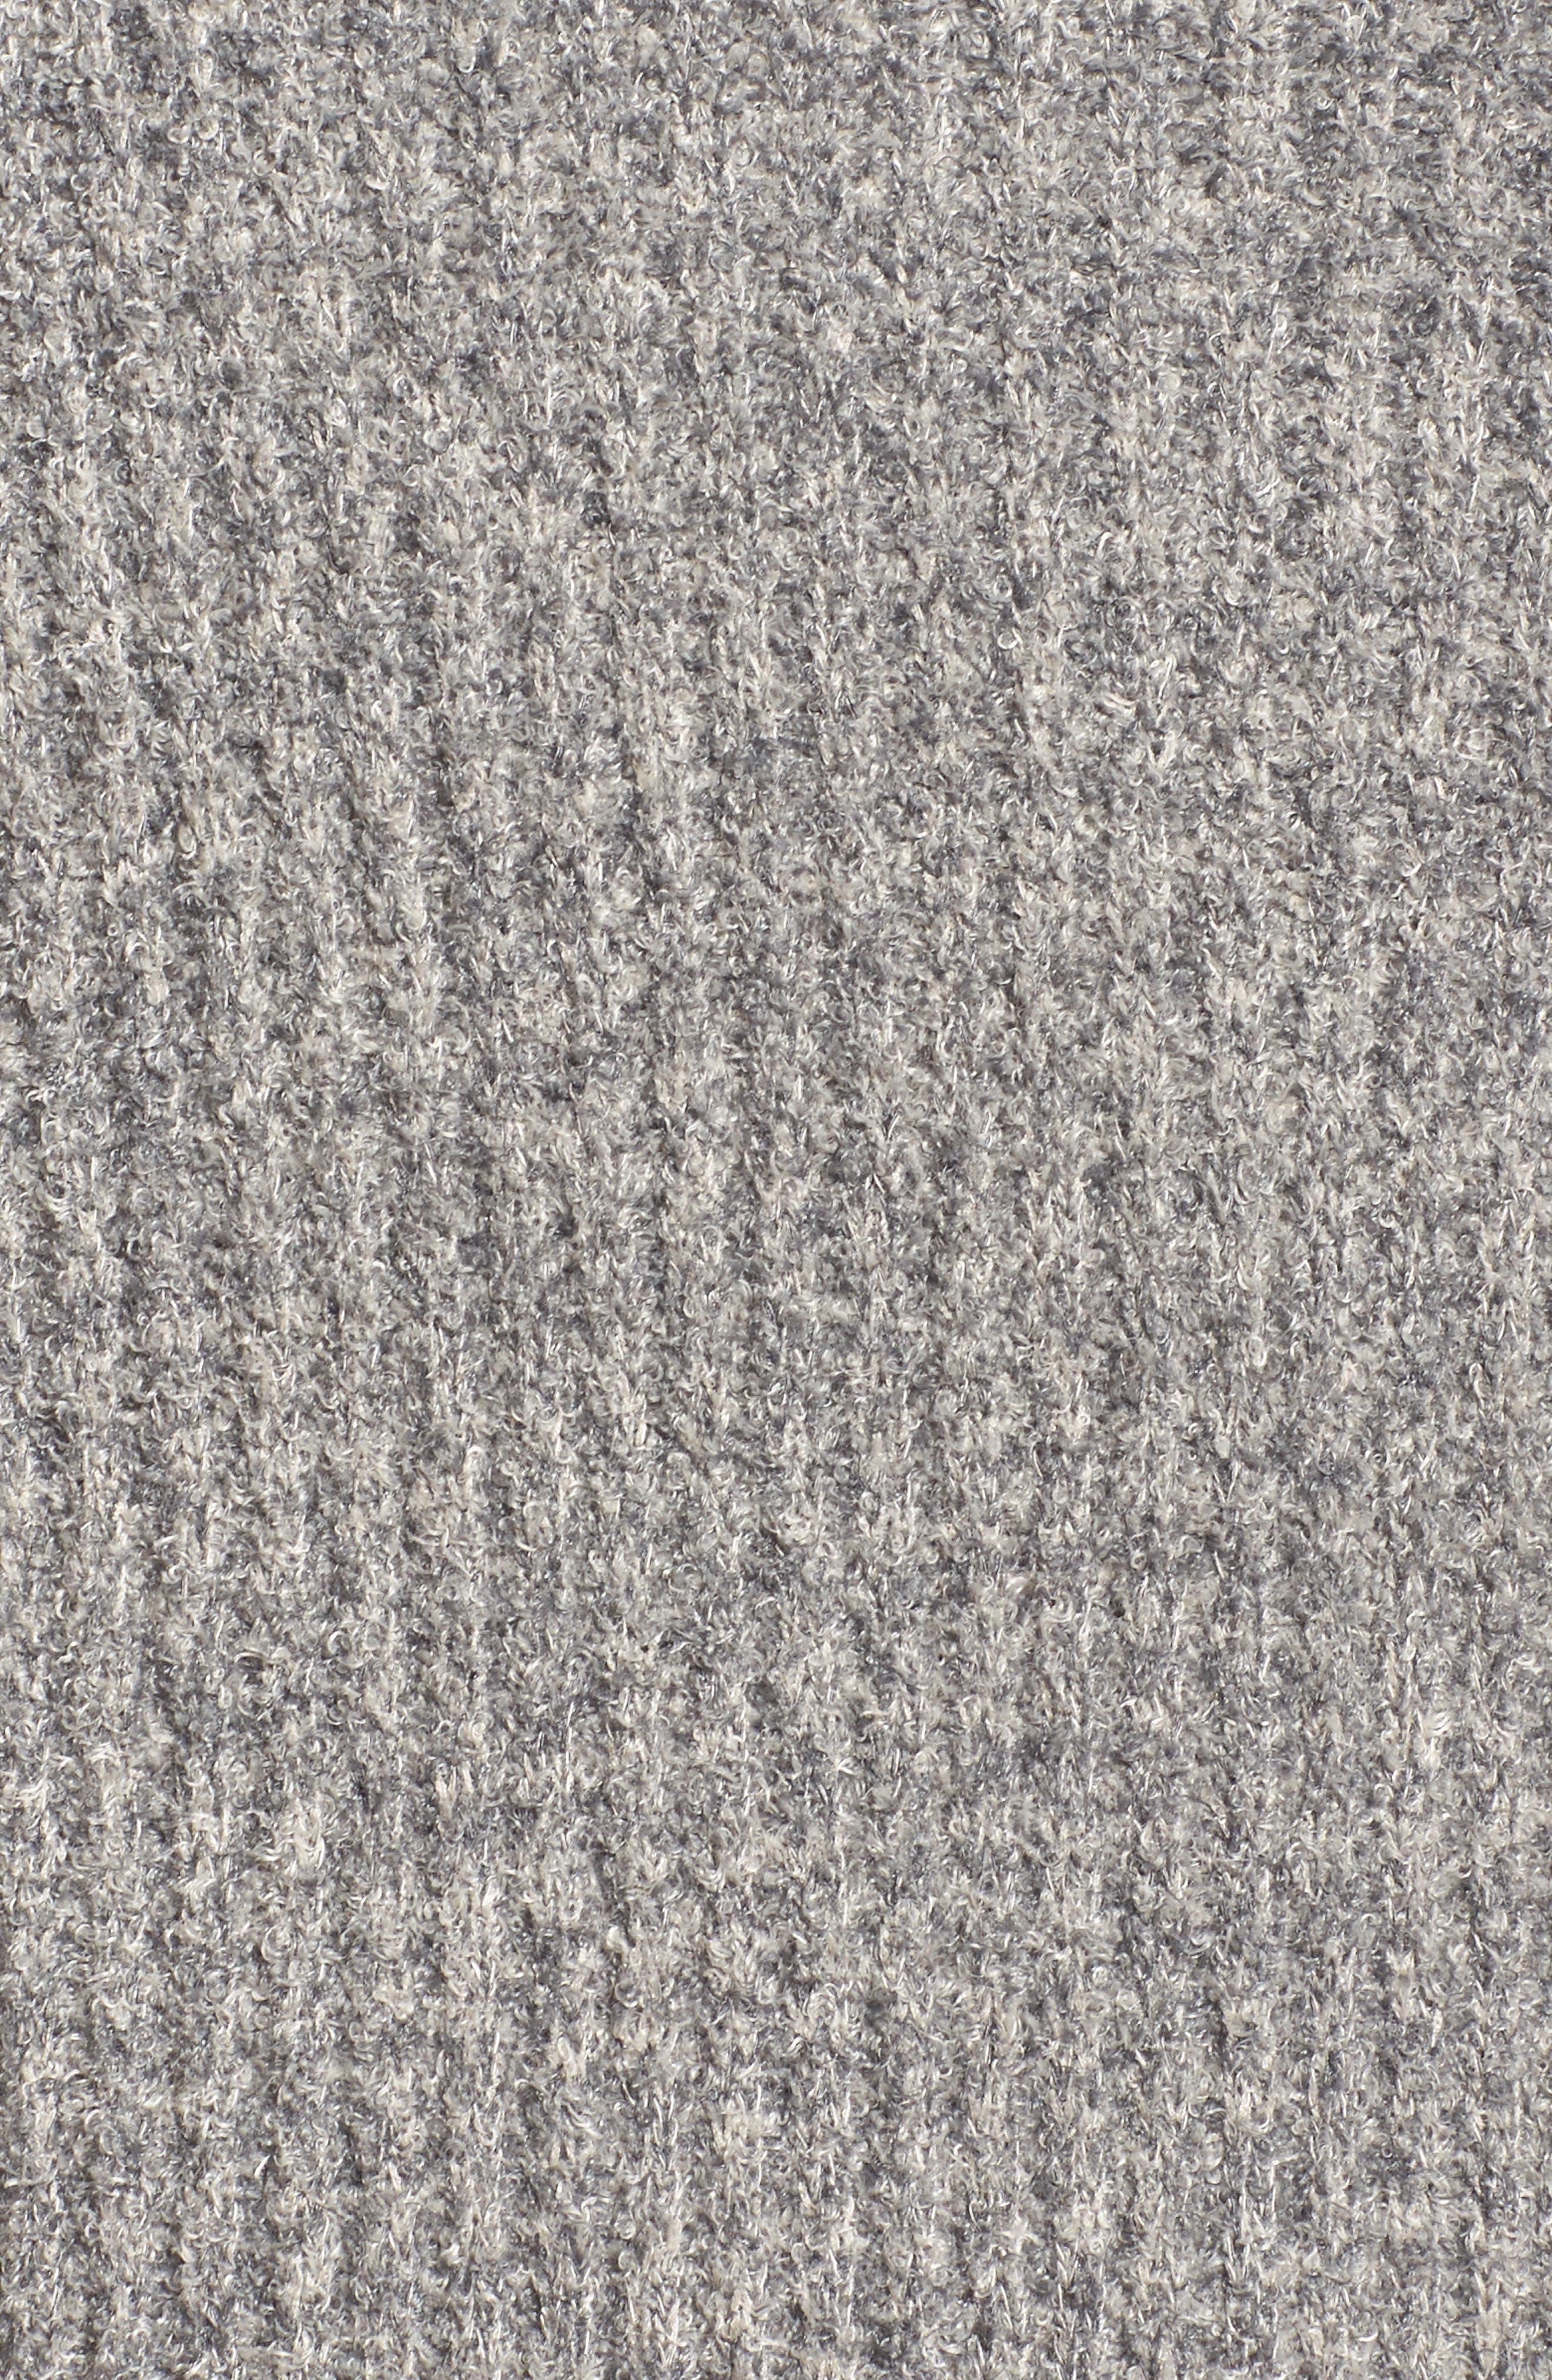 Montecito Cardigan,                             Alternate thumbnail 6, color,                             Graphite/ Stone